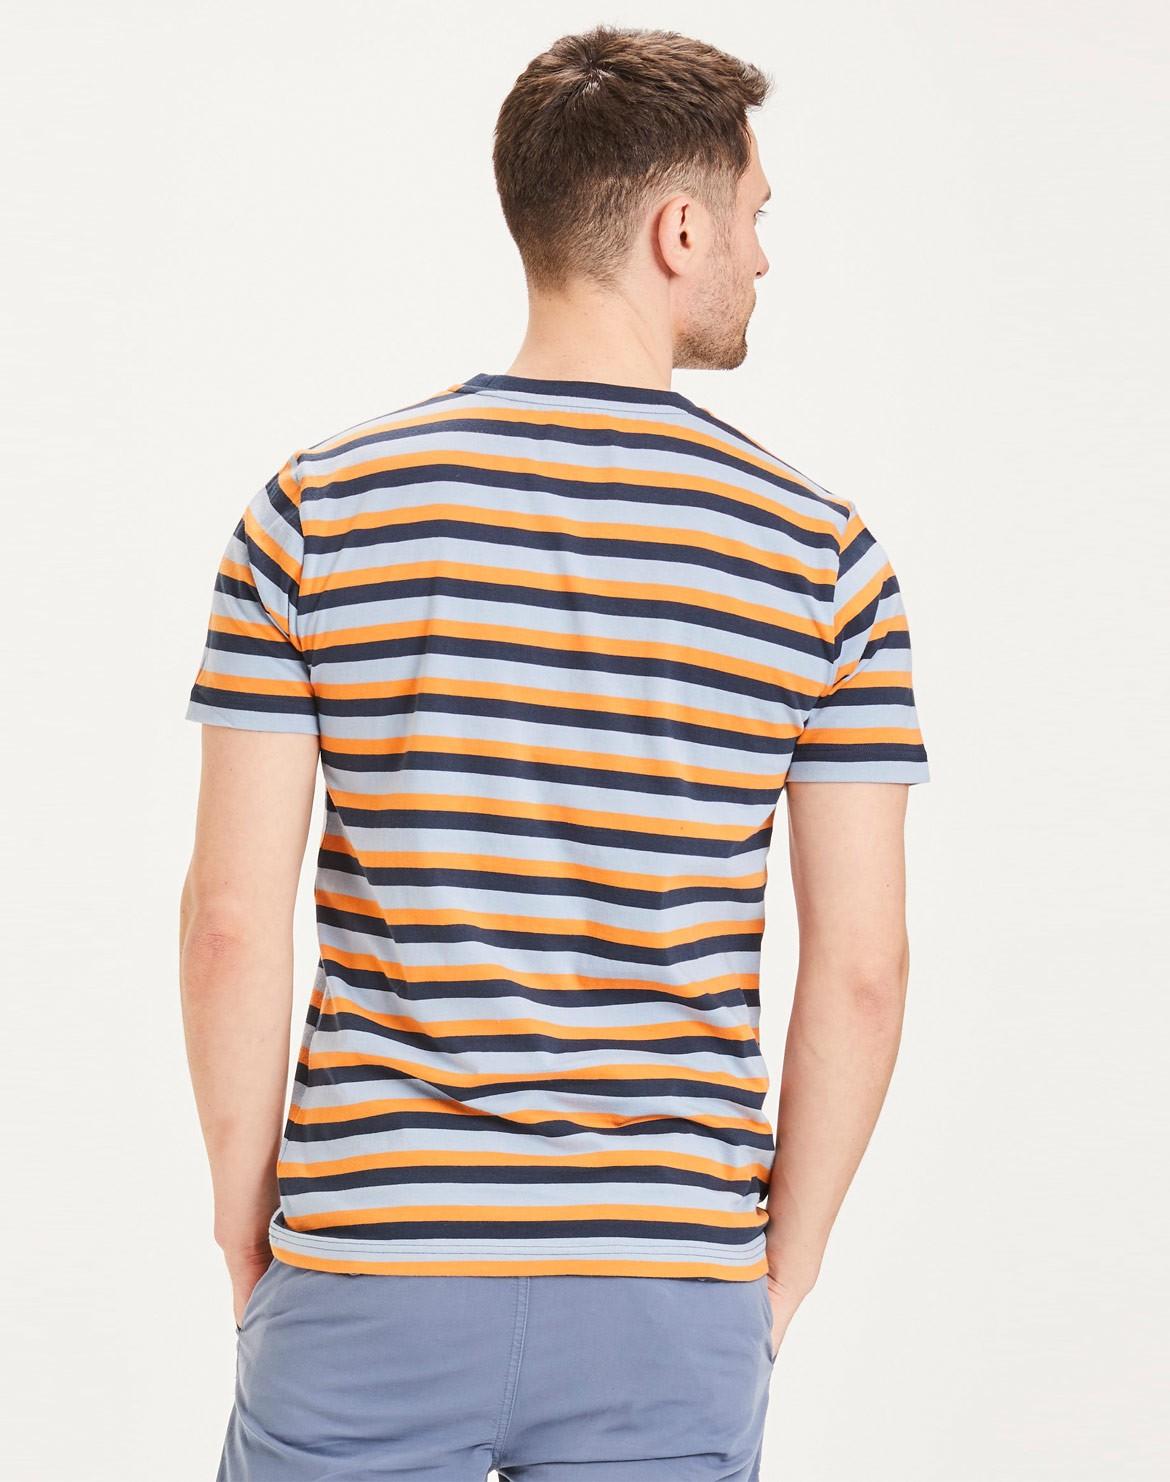 Alder Triple Striped T-Shirt